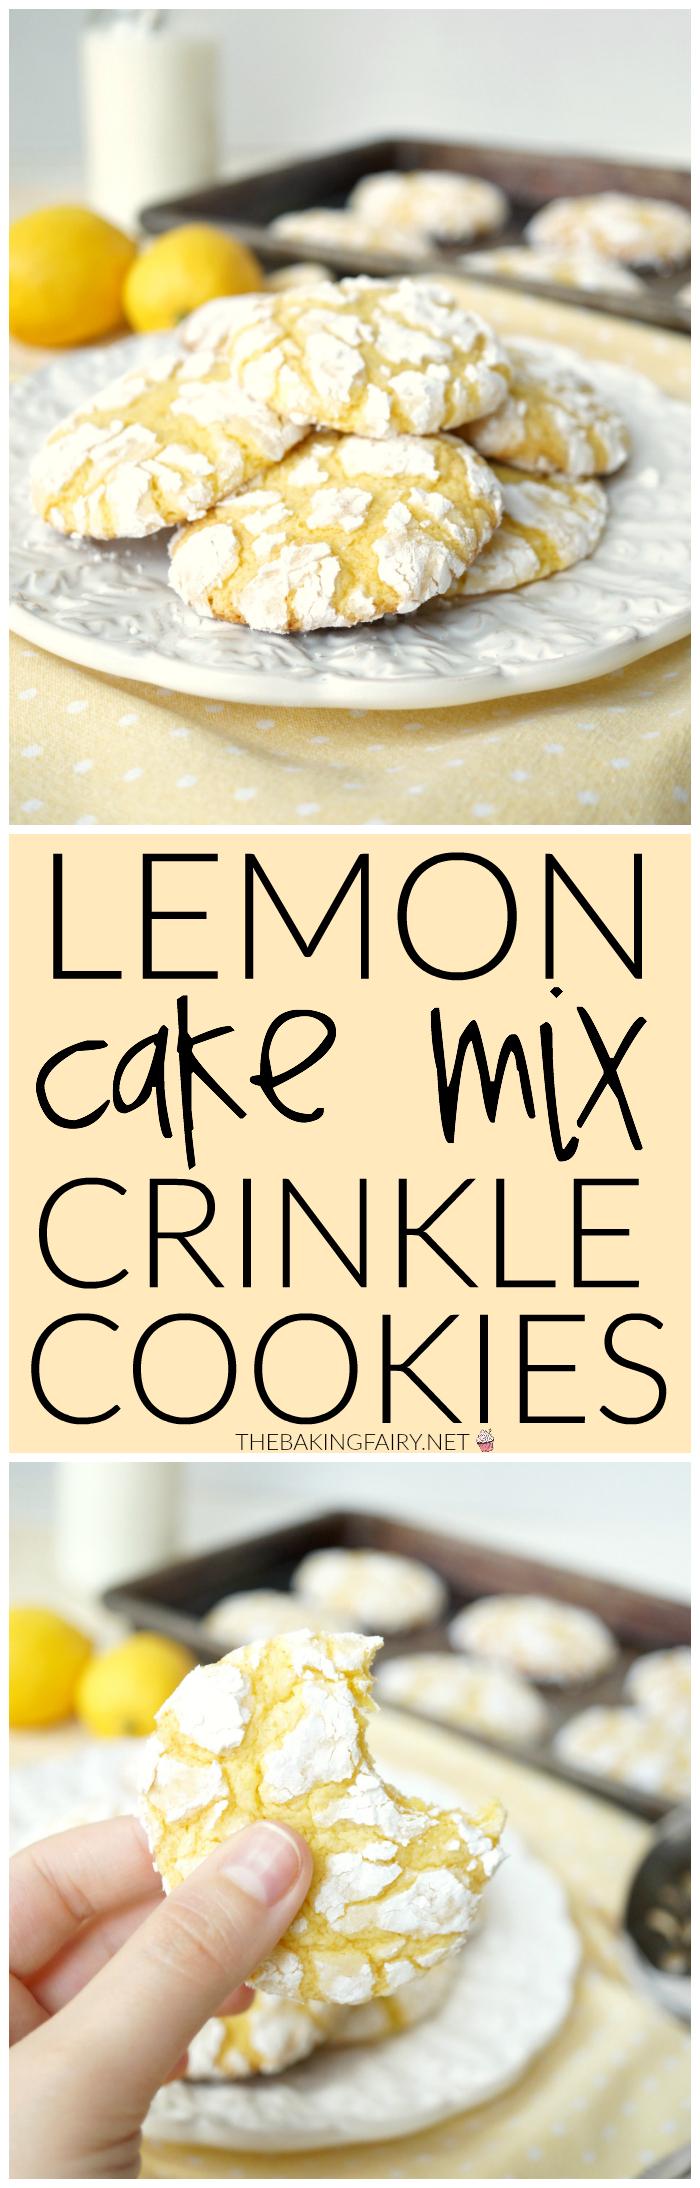 lemon cake mix crinkle cookies | The Baking Fairy